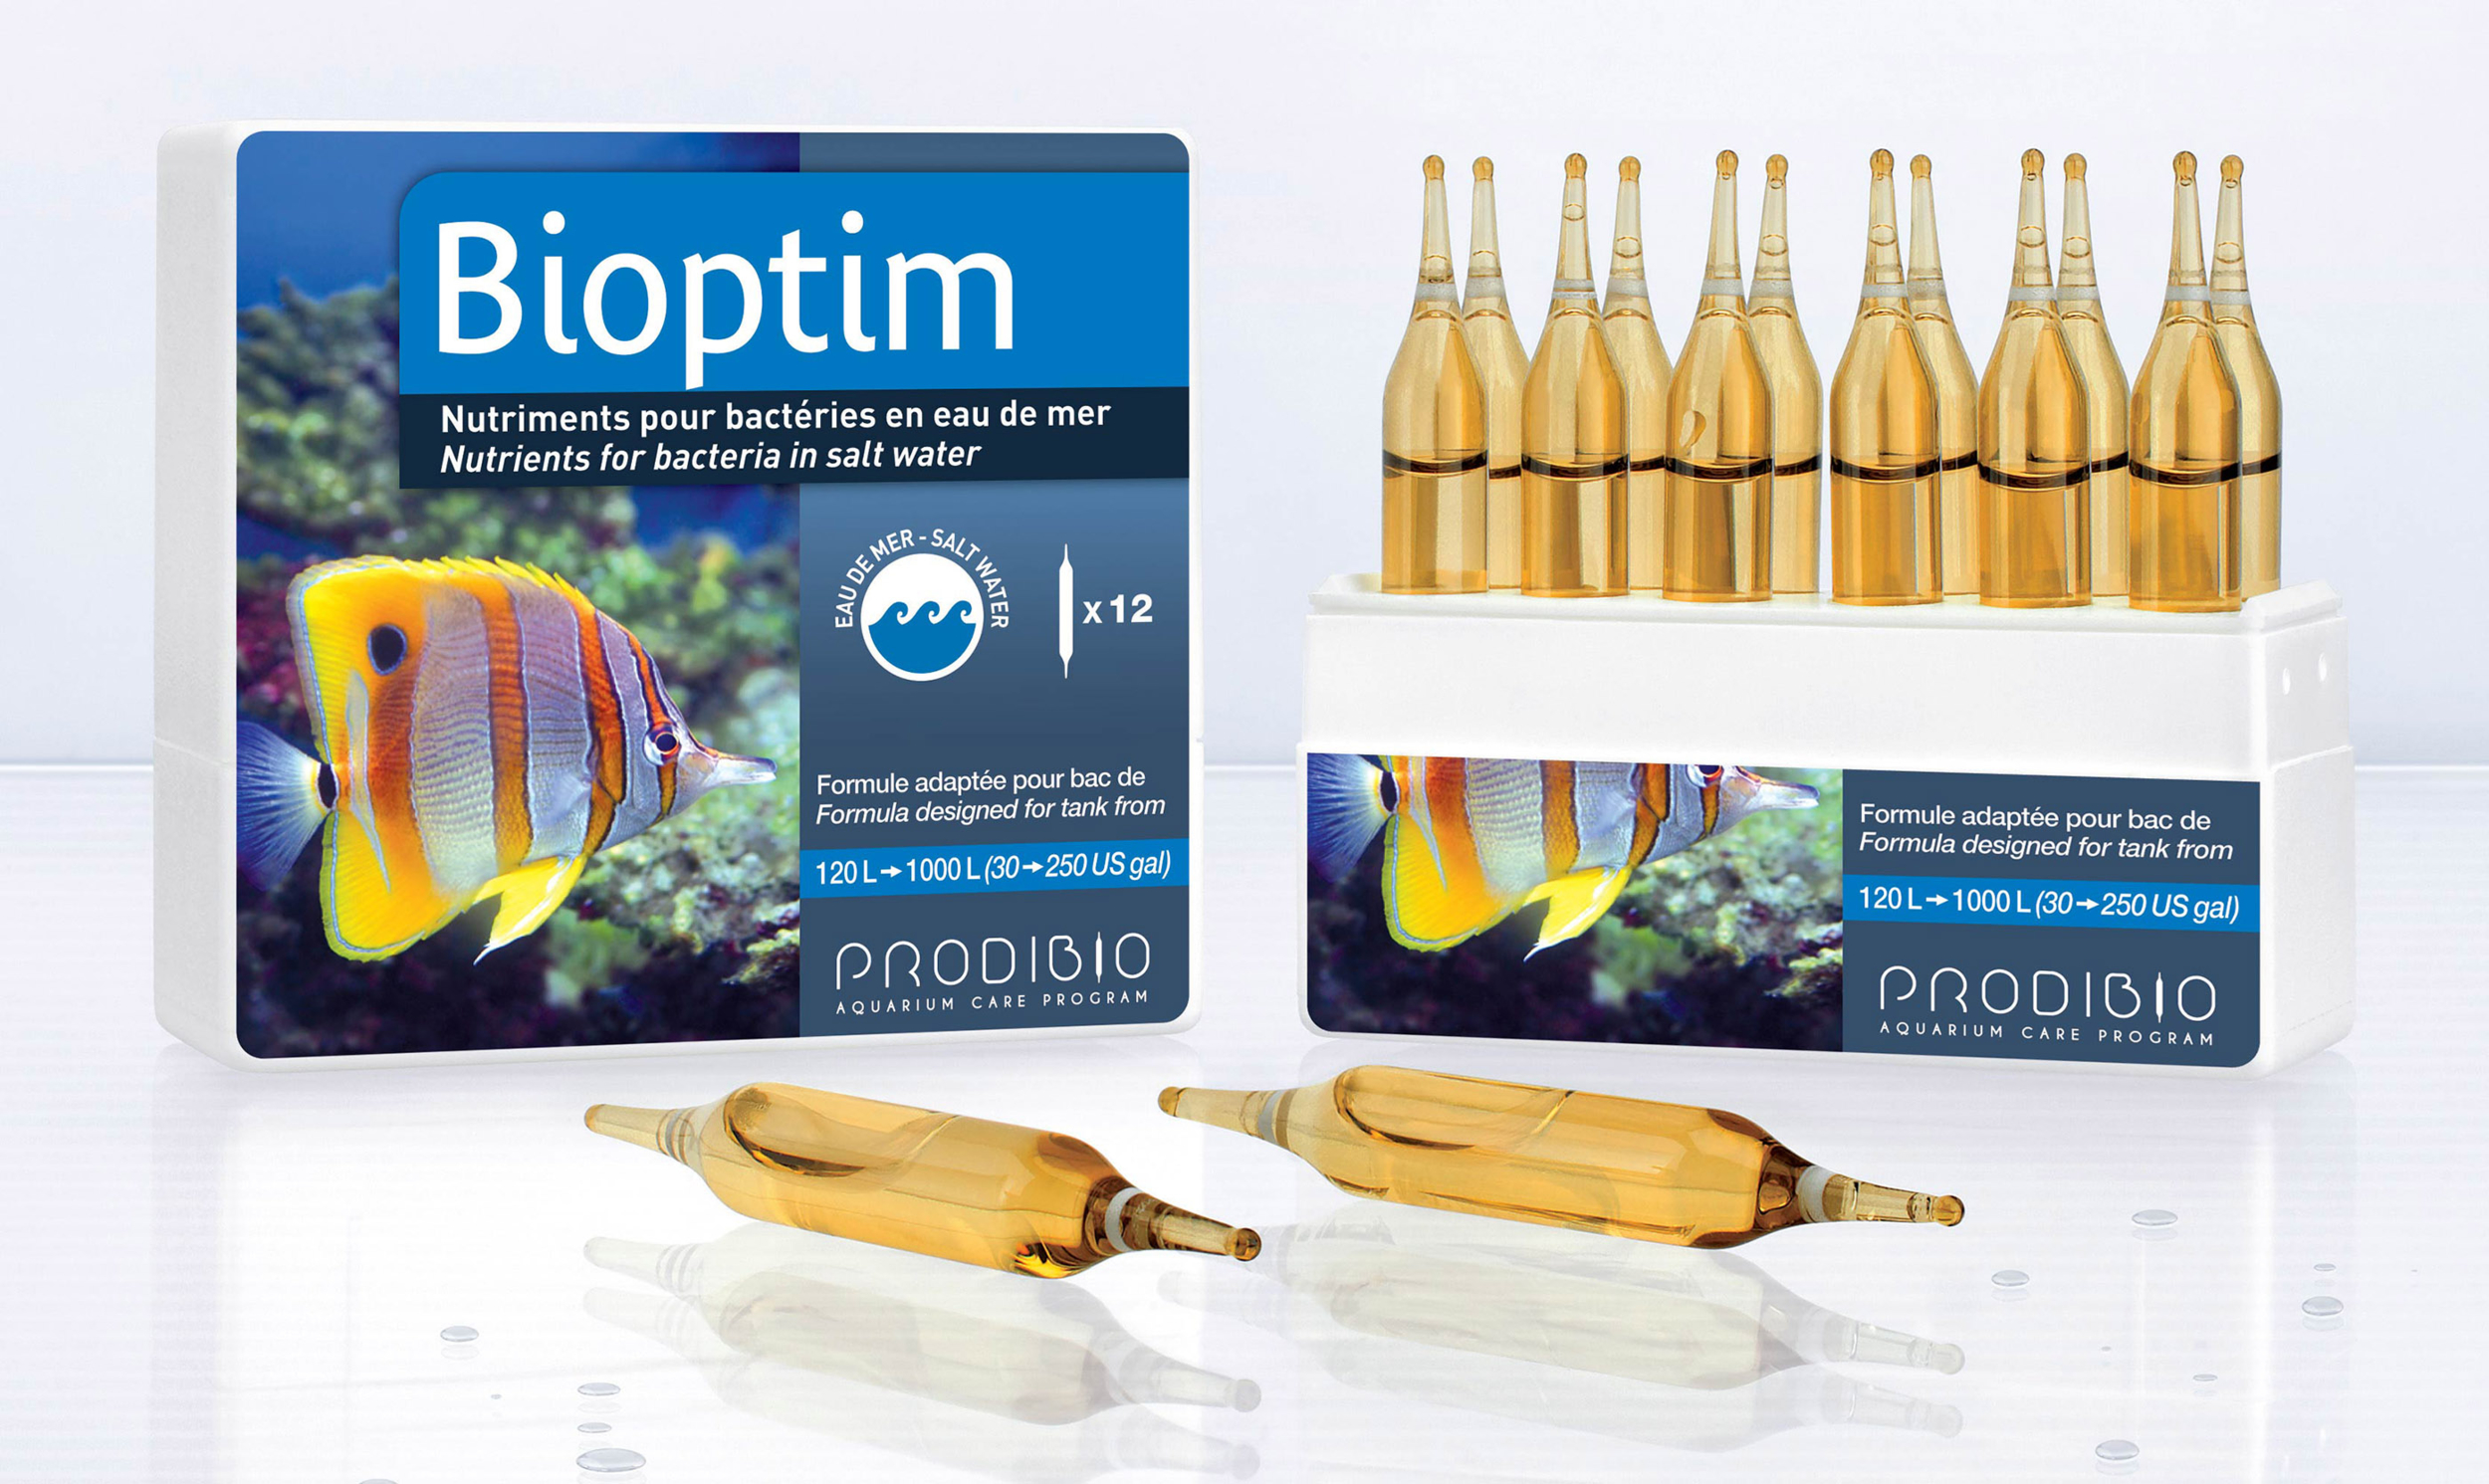 bioptim_-_12_-_prodibio_0